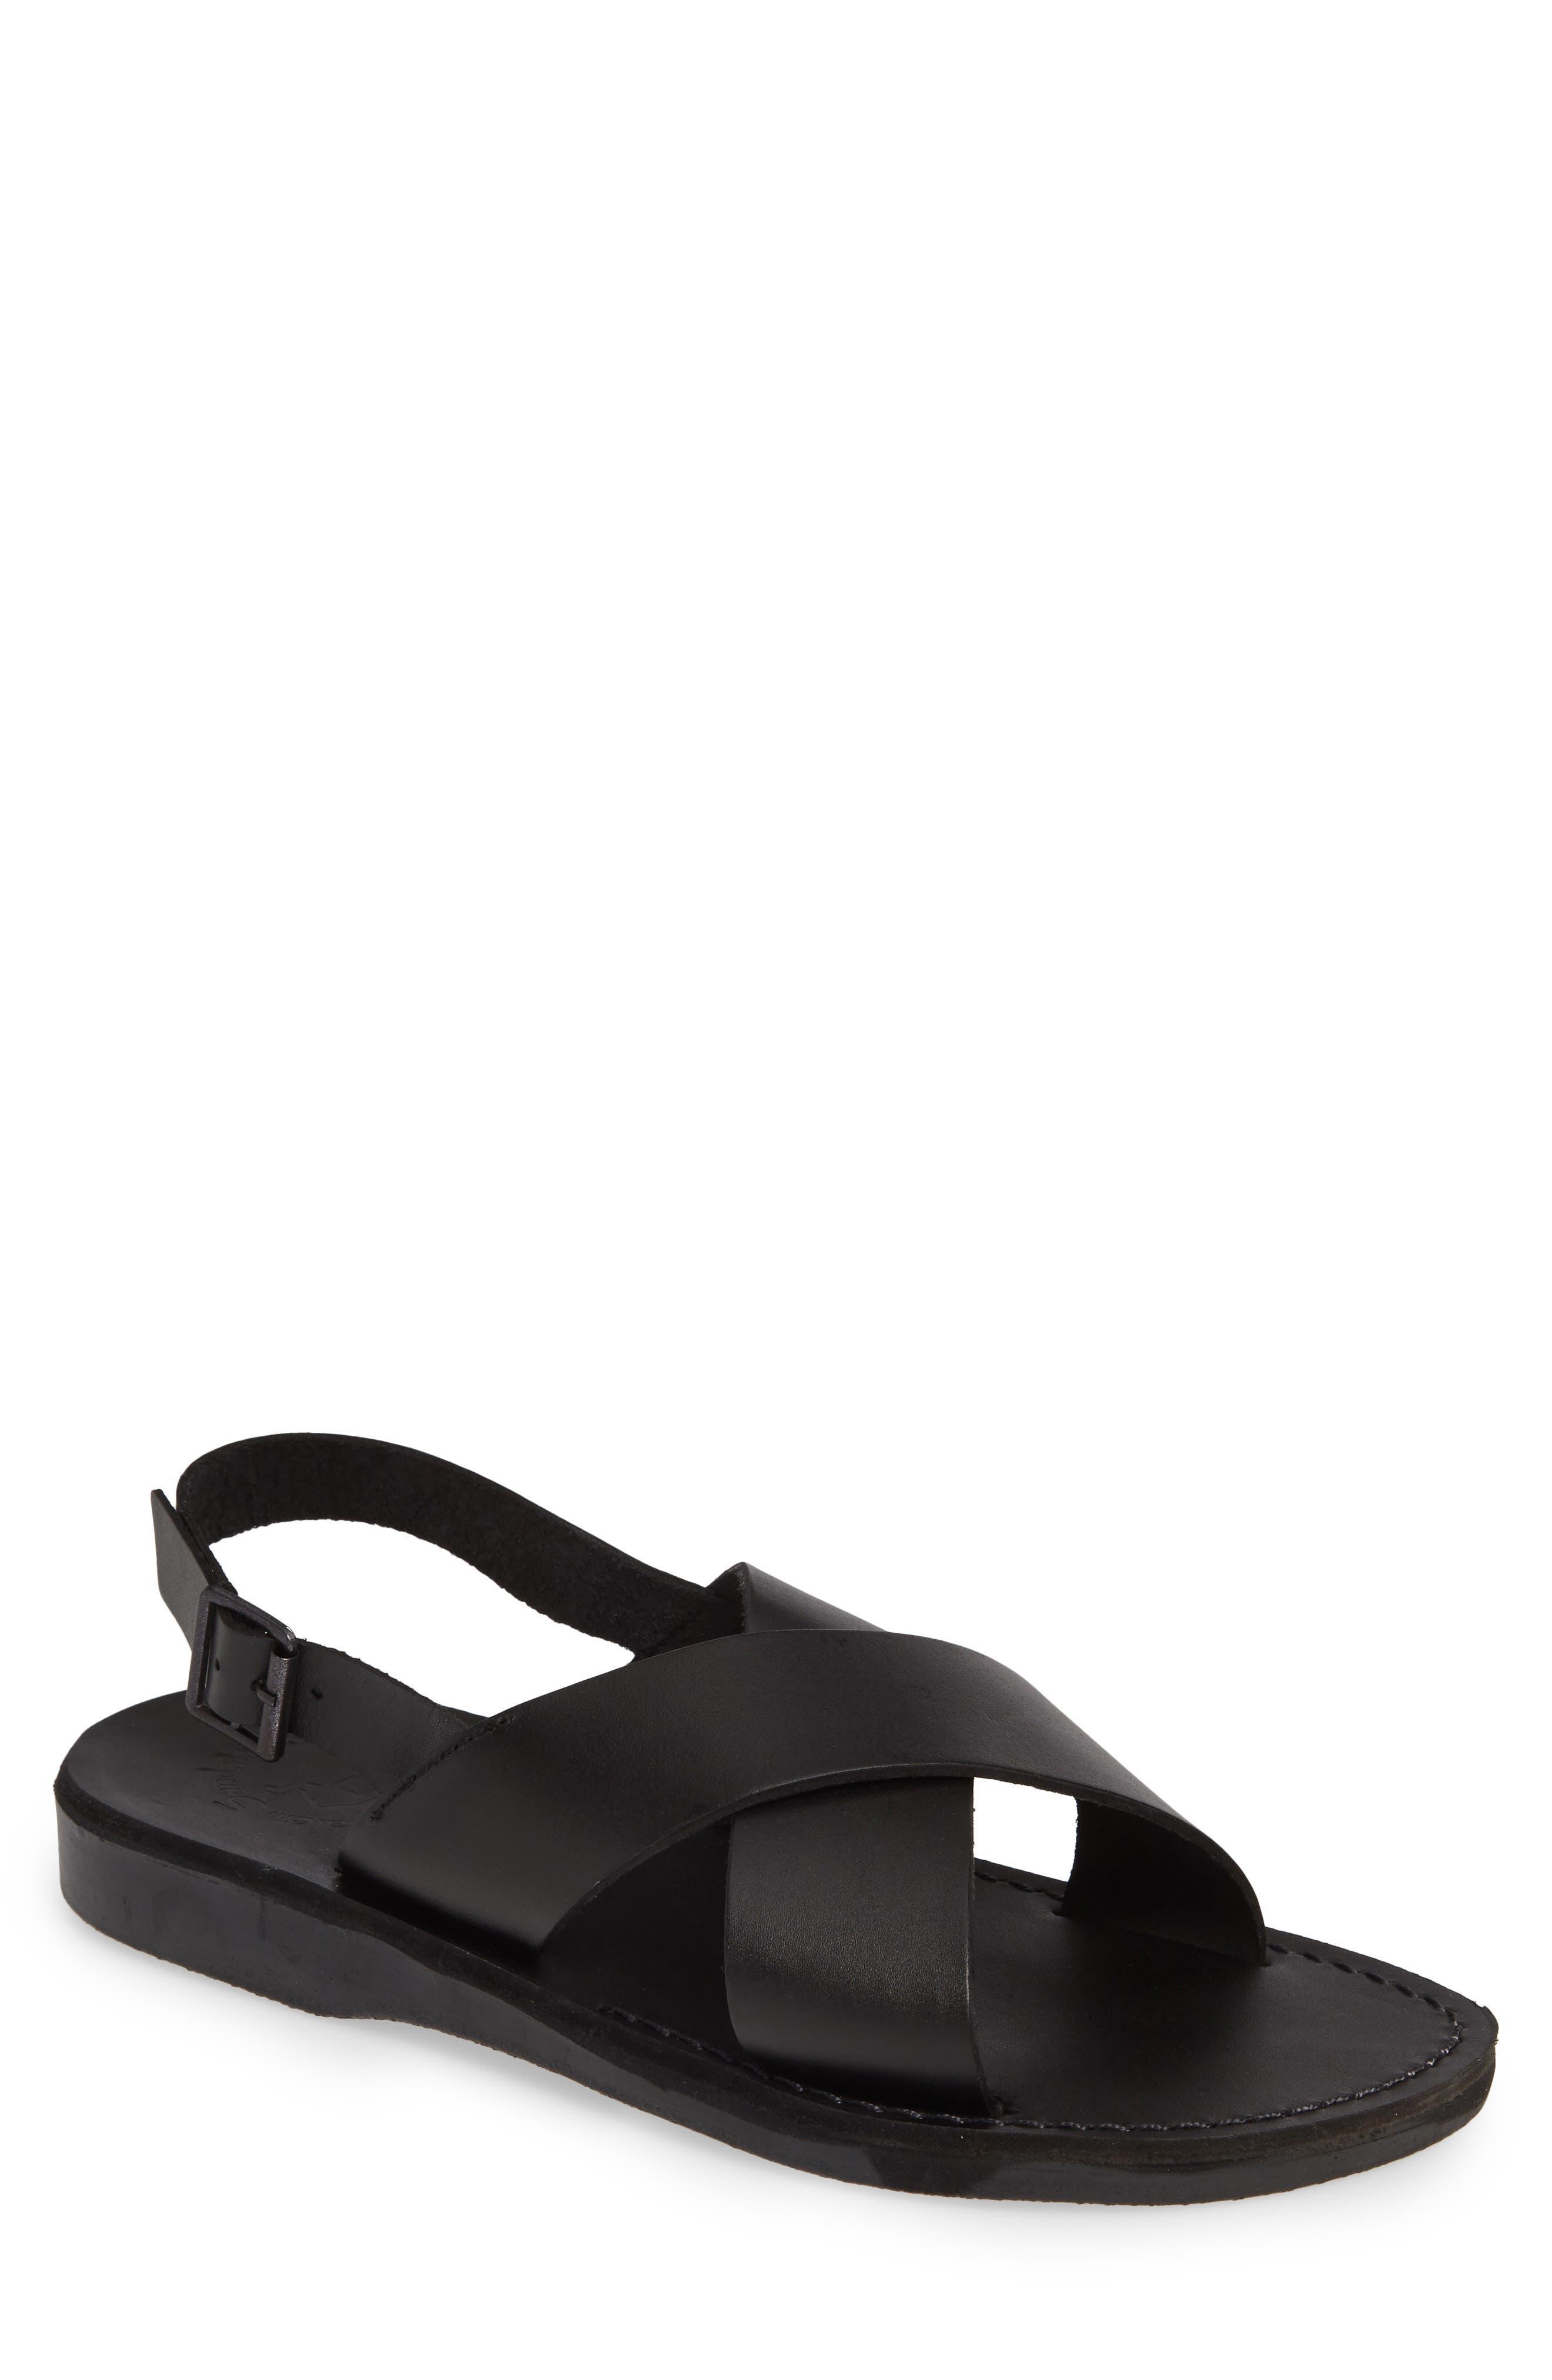 Elan Sandal, Main, color, BLACK